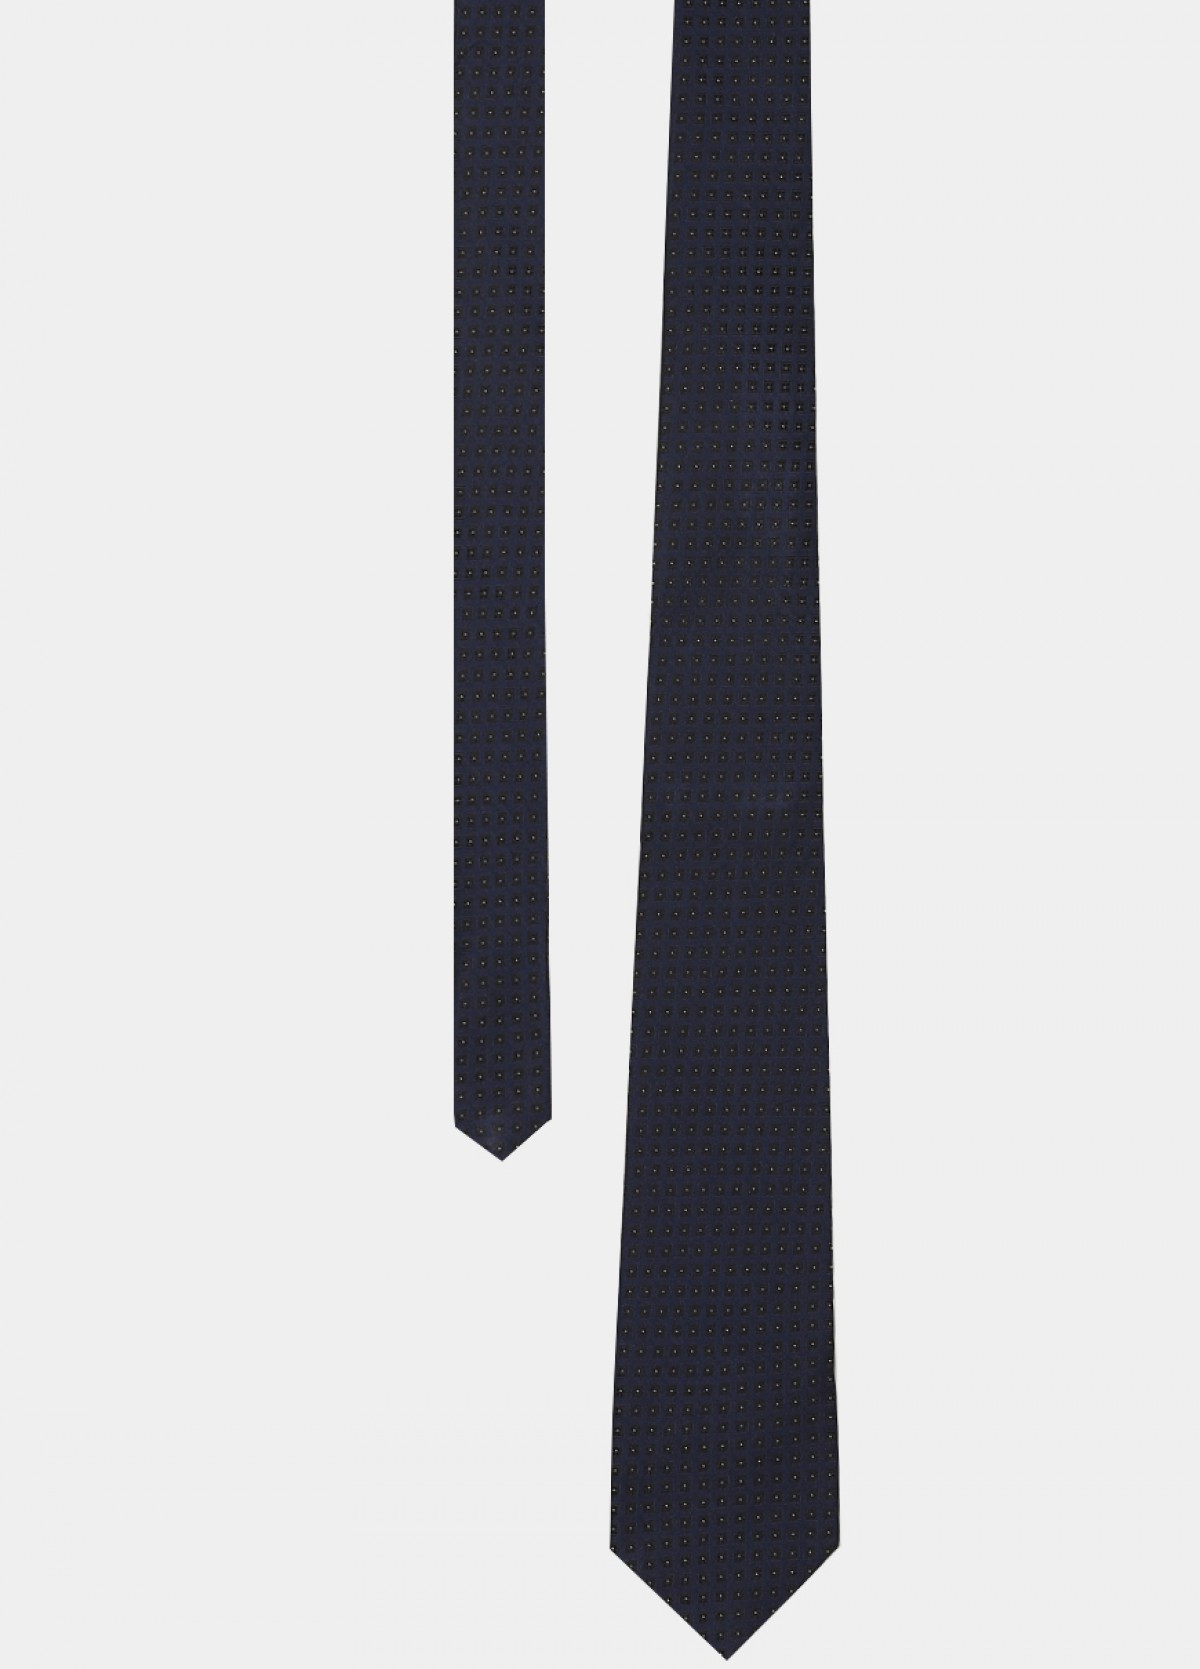 Navy Blue Woven Silk Tie